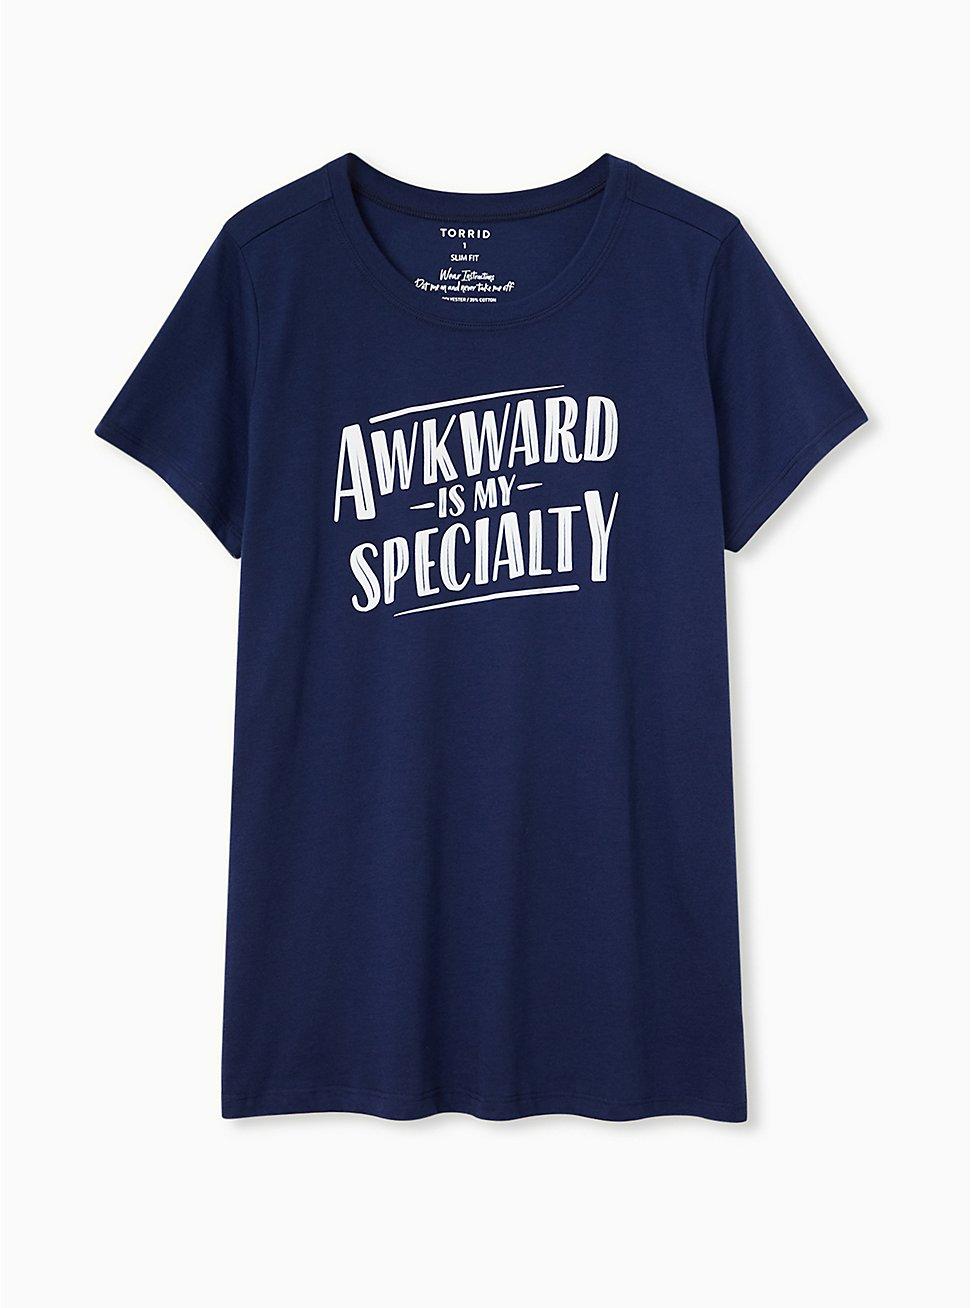 Awkward Is My Specialty Slim Fit Crew Tee - Navy, PEACOAT, hi-res